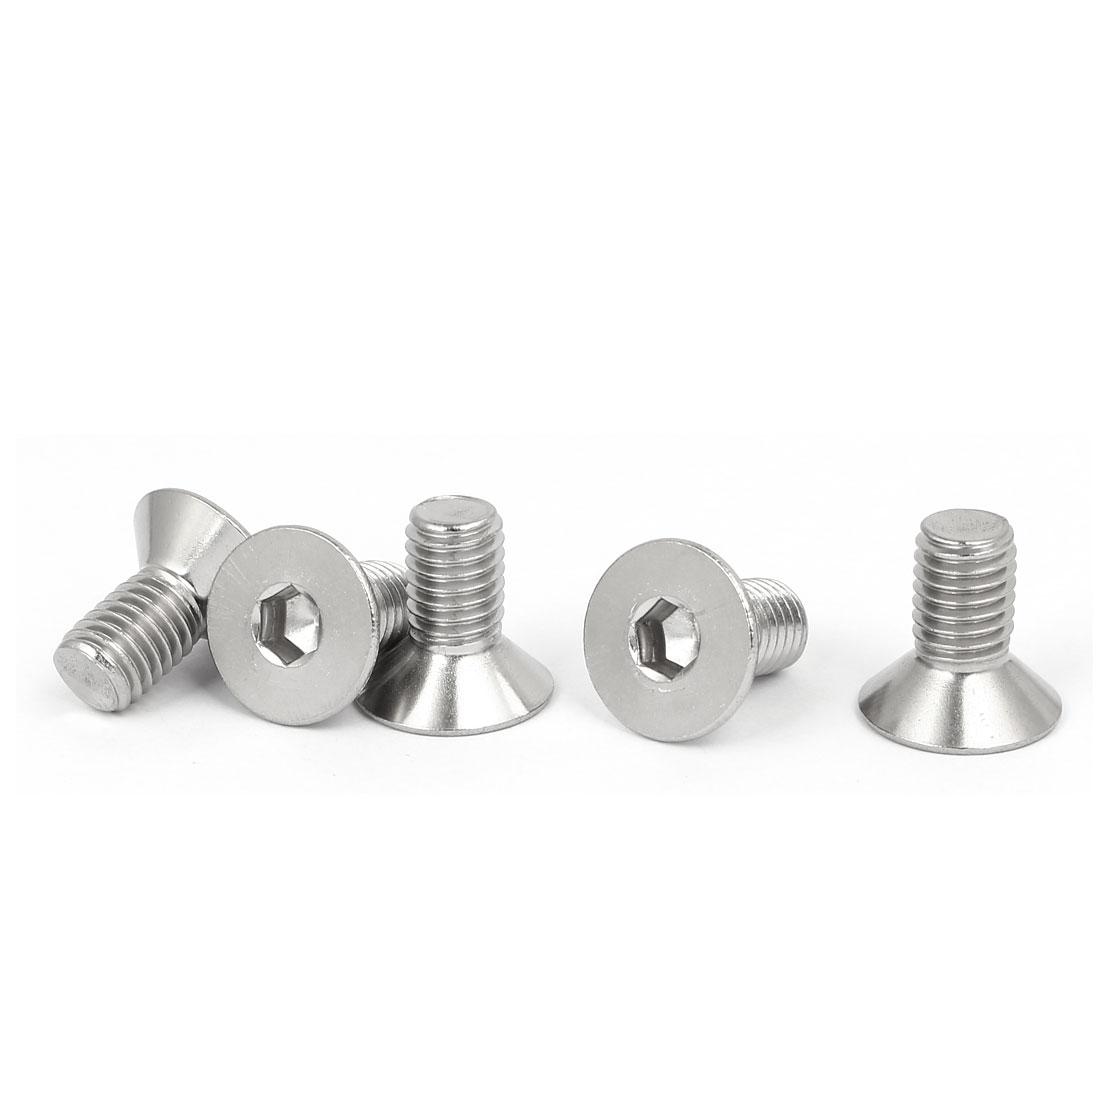 M8x16mm 316 Stainless Steel Fully Thread Flat Head Hex Socket Cap Screw 5pcs